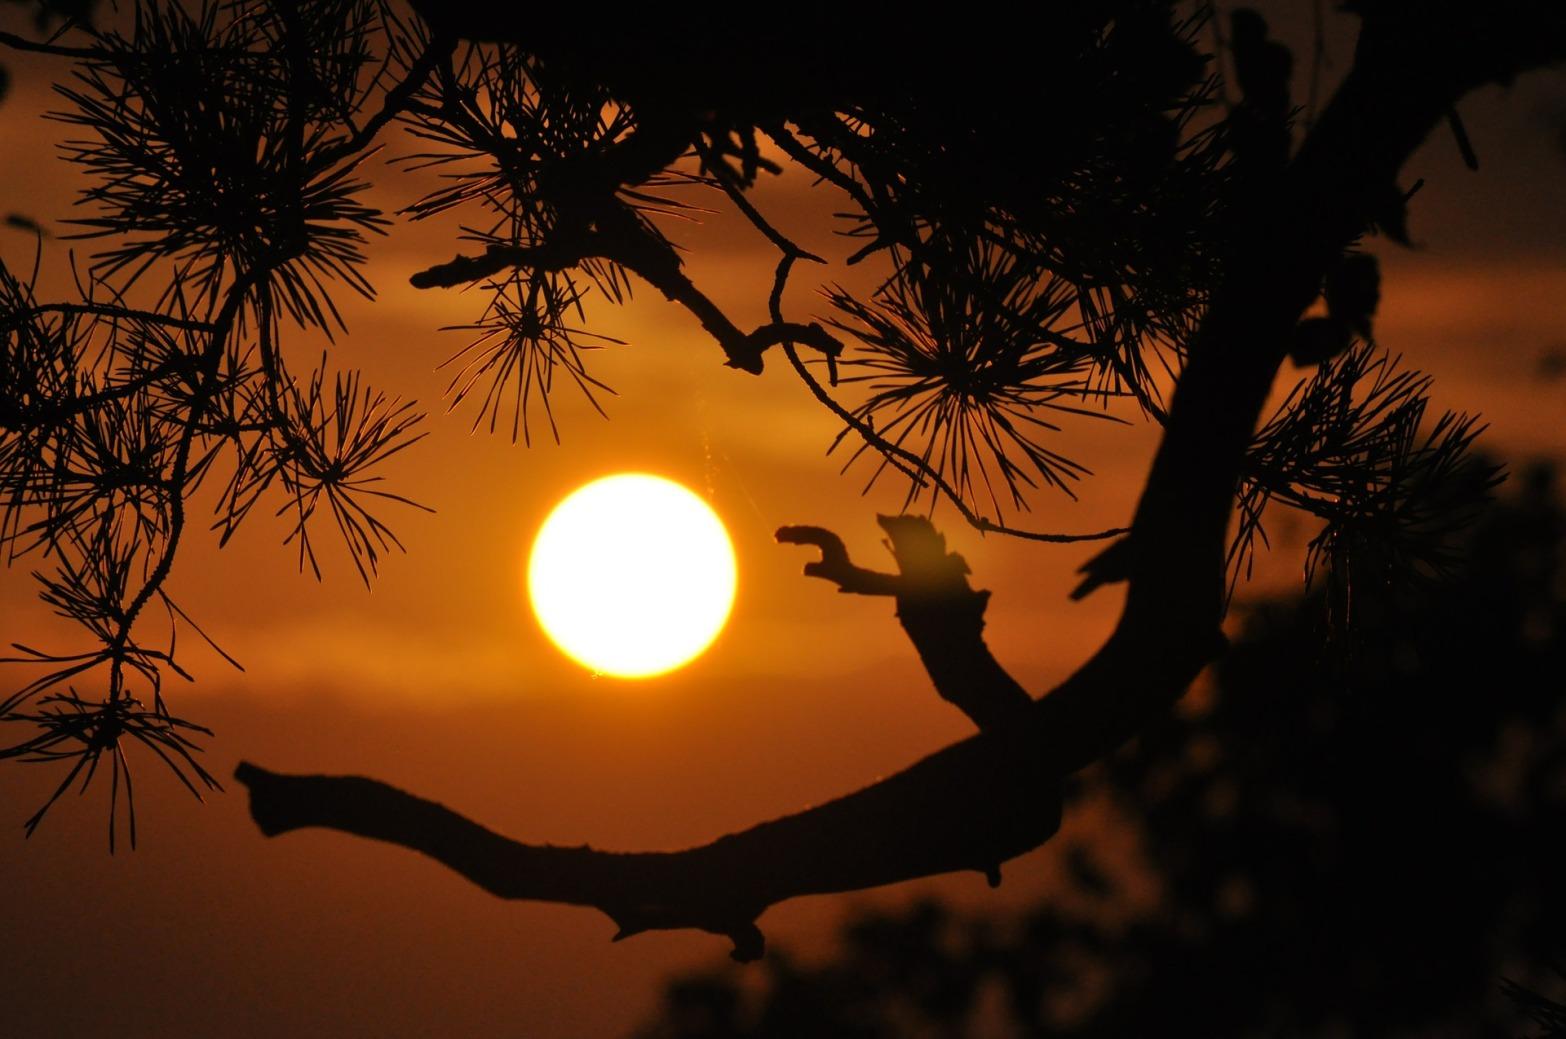 sunset-396633_1920